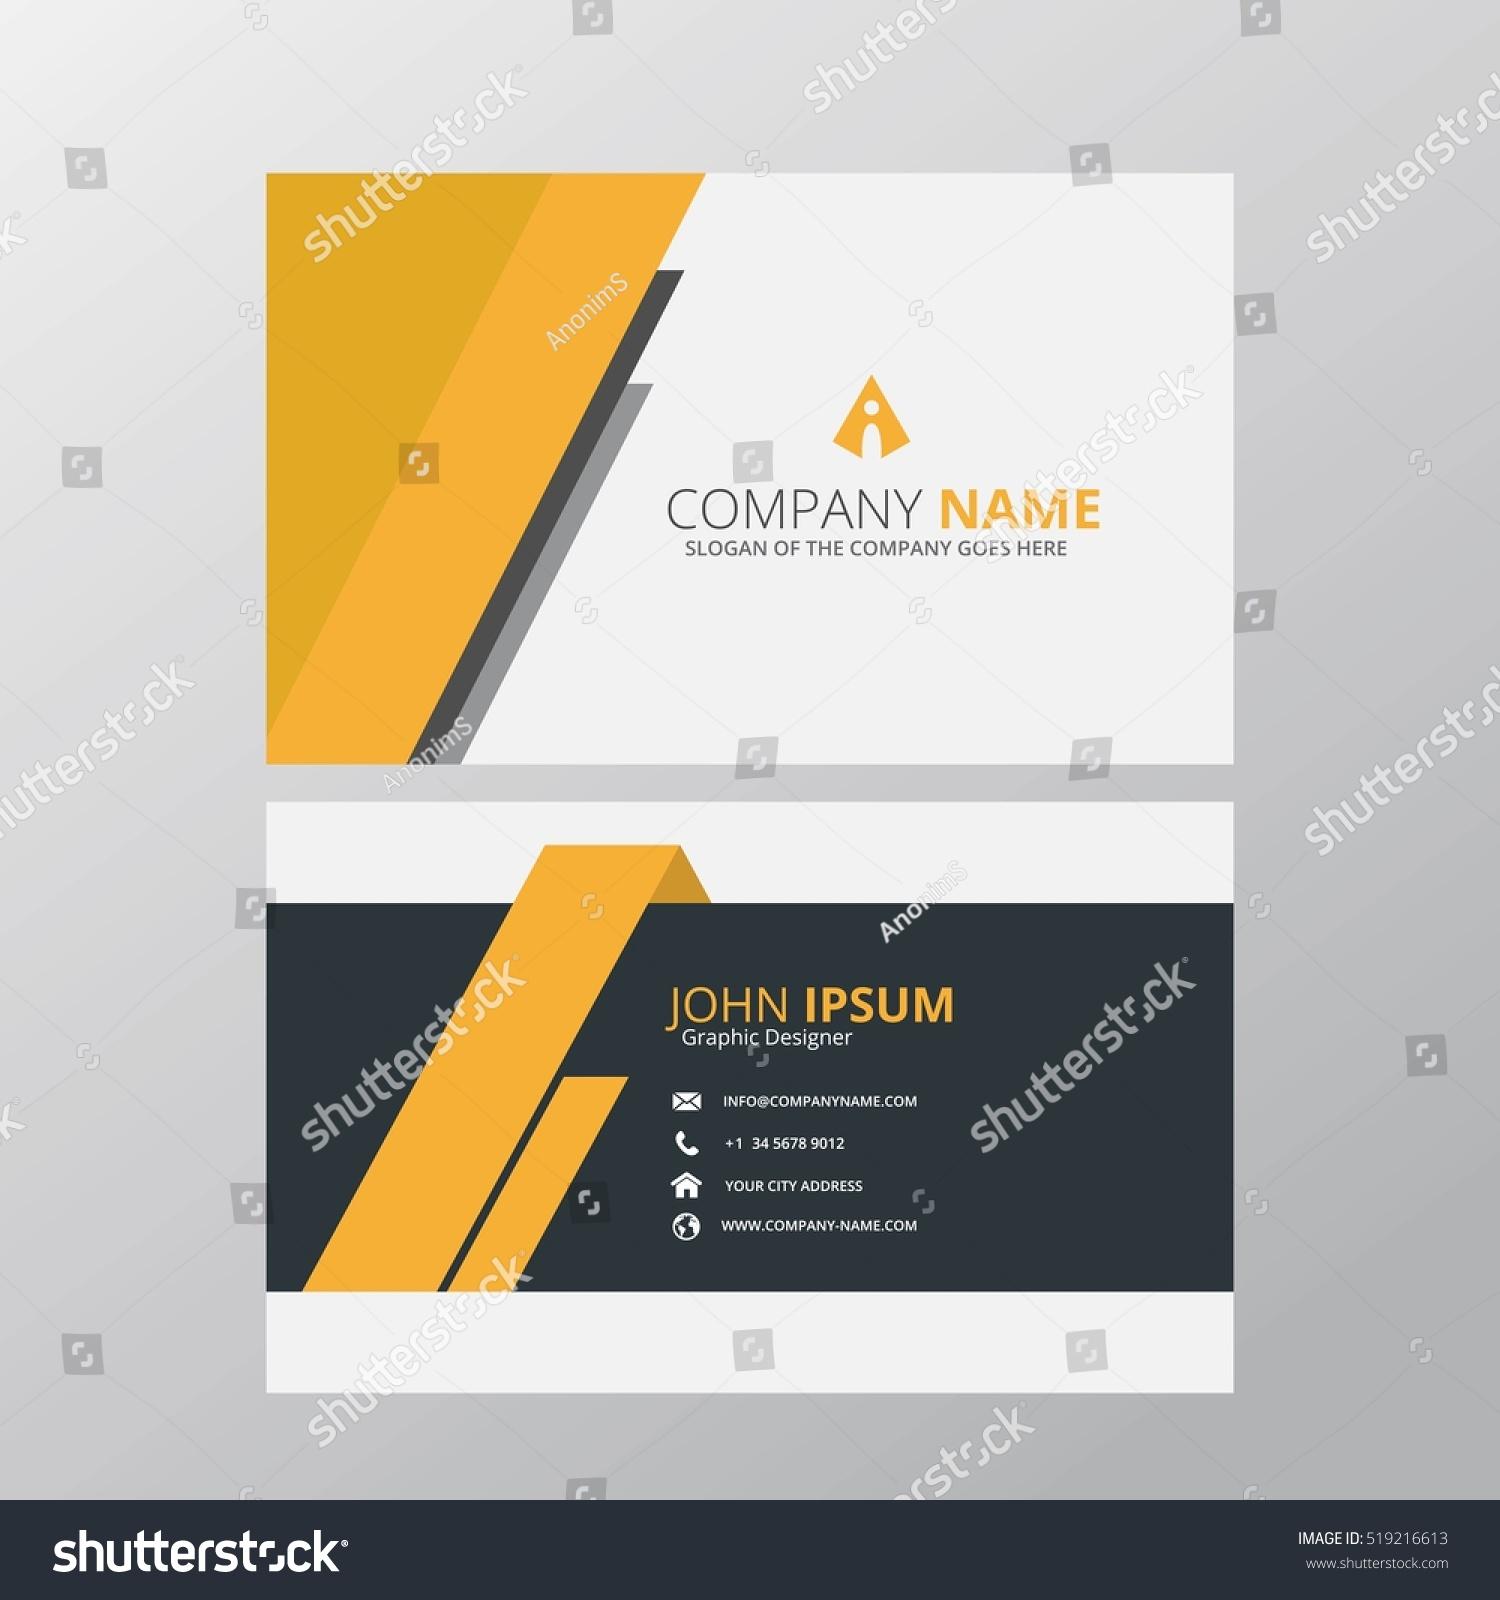 Business Card Website Template Gallery Templates Example Free - Business card website template